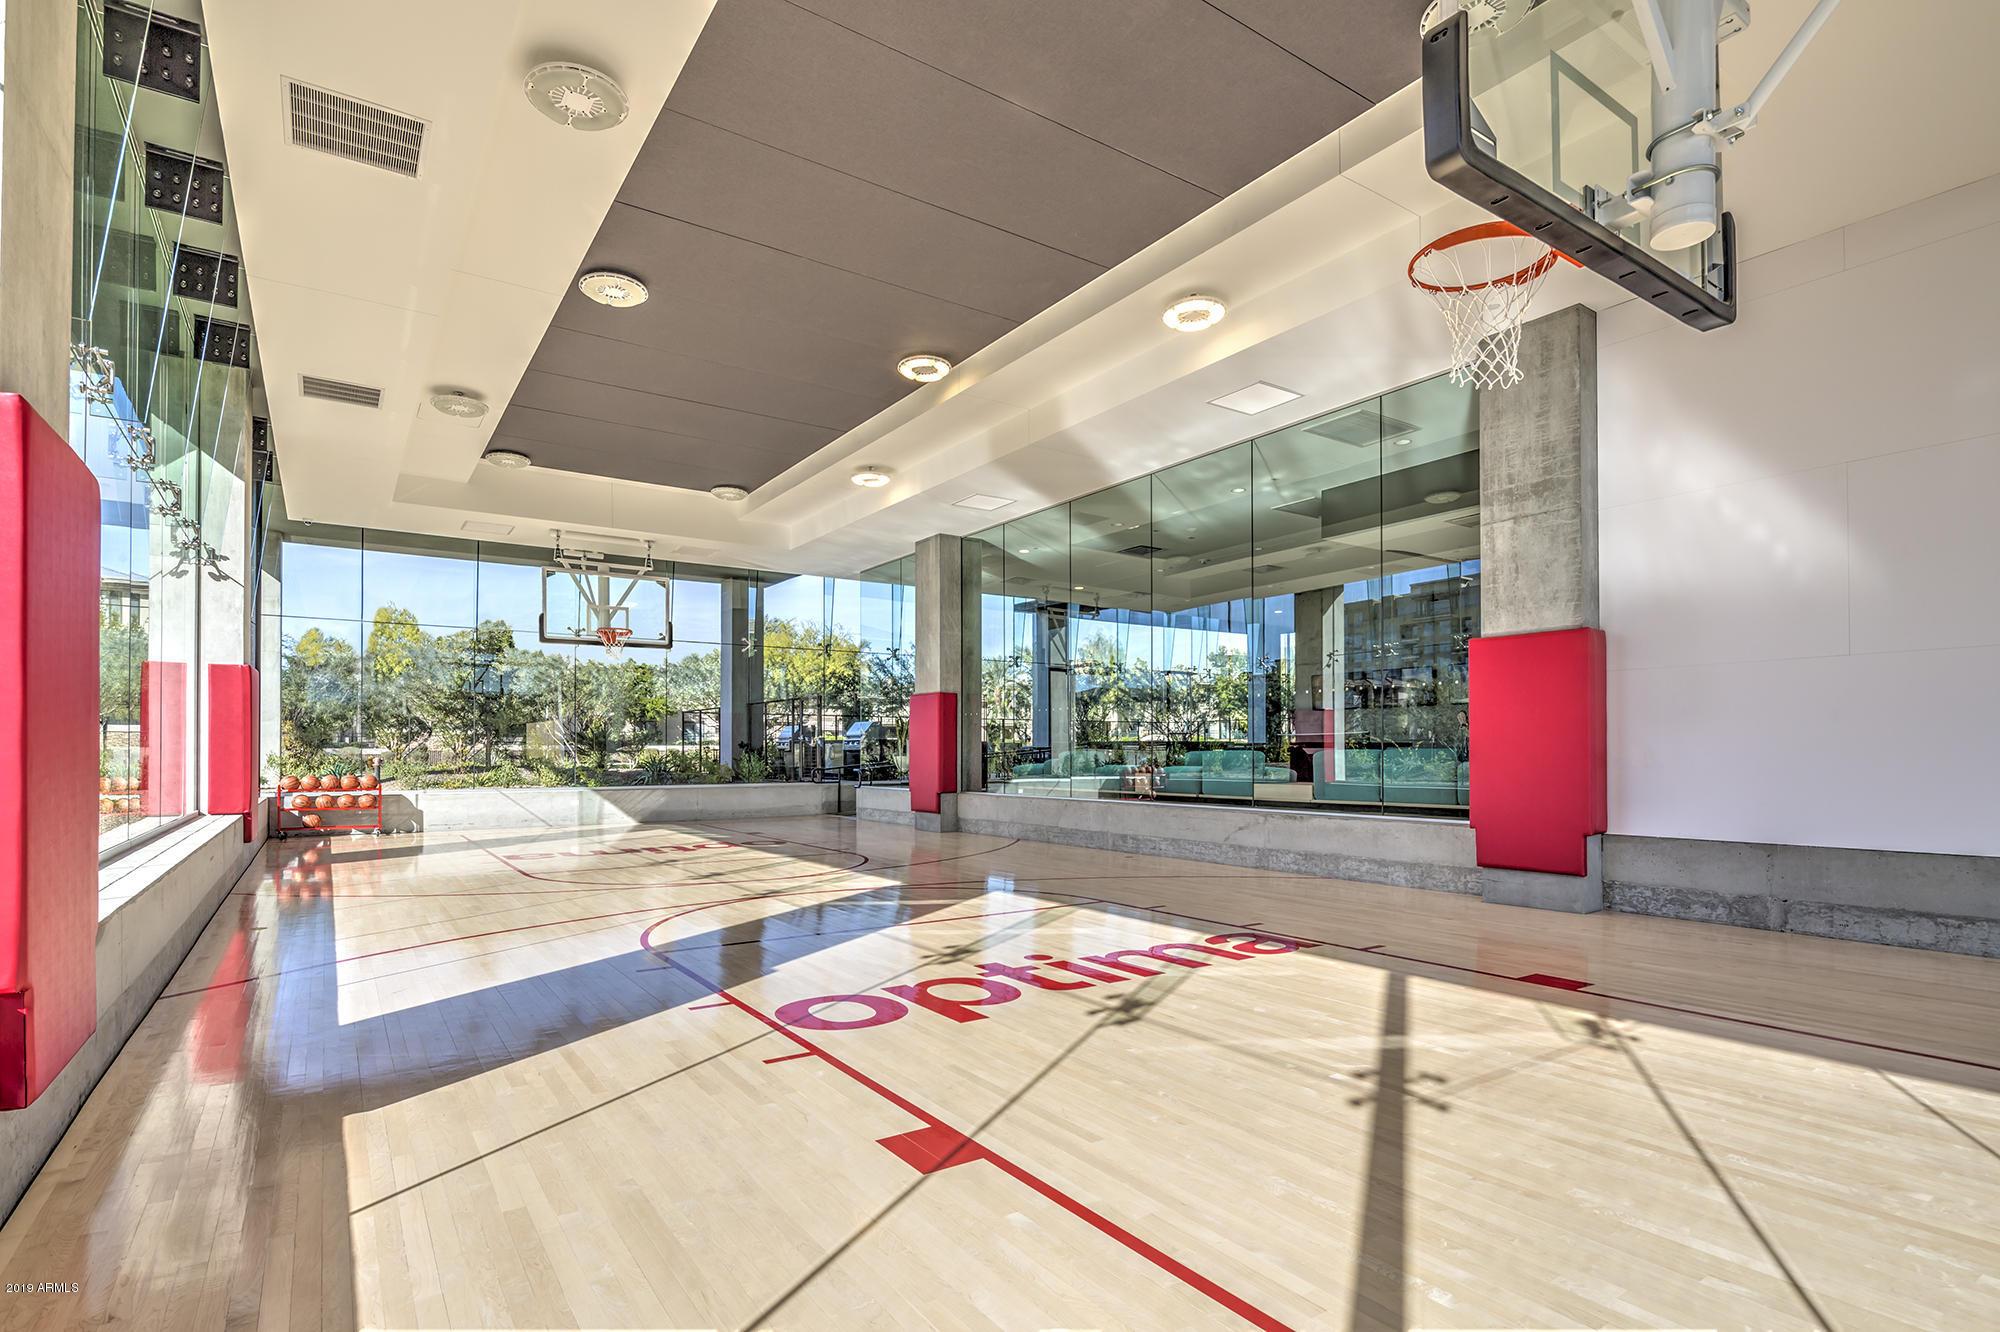 MLS 5959049 7180 E Kierland Boulevard Unit 815.6.7 Building 71, Scottsdale, AZ 85254 Scottsdale AZ Scottsdale Airpark Area